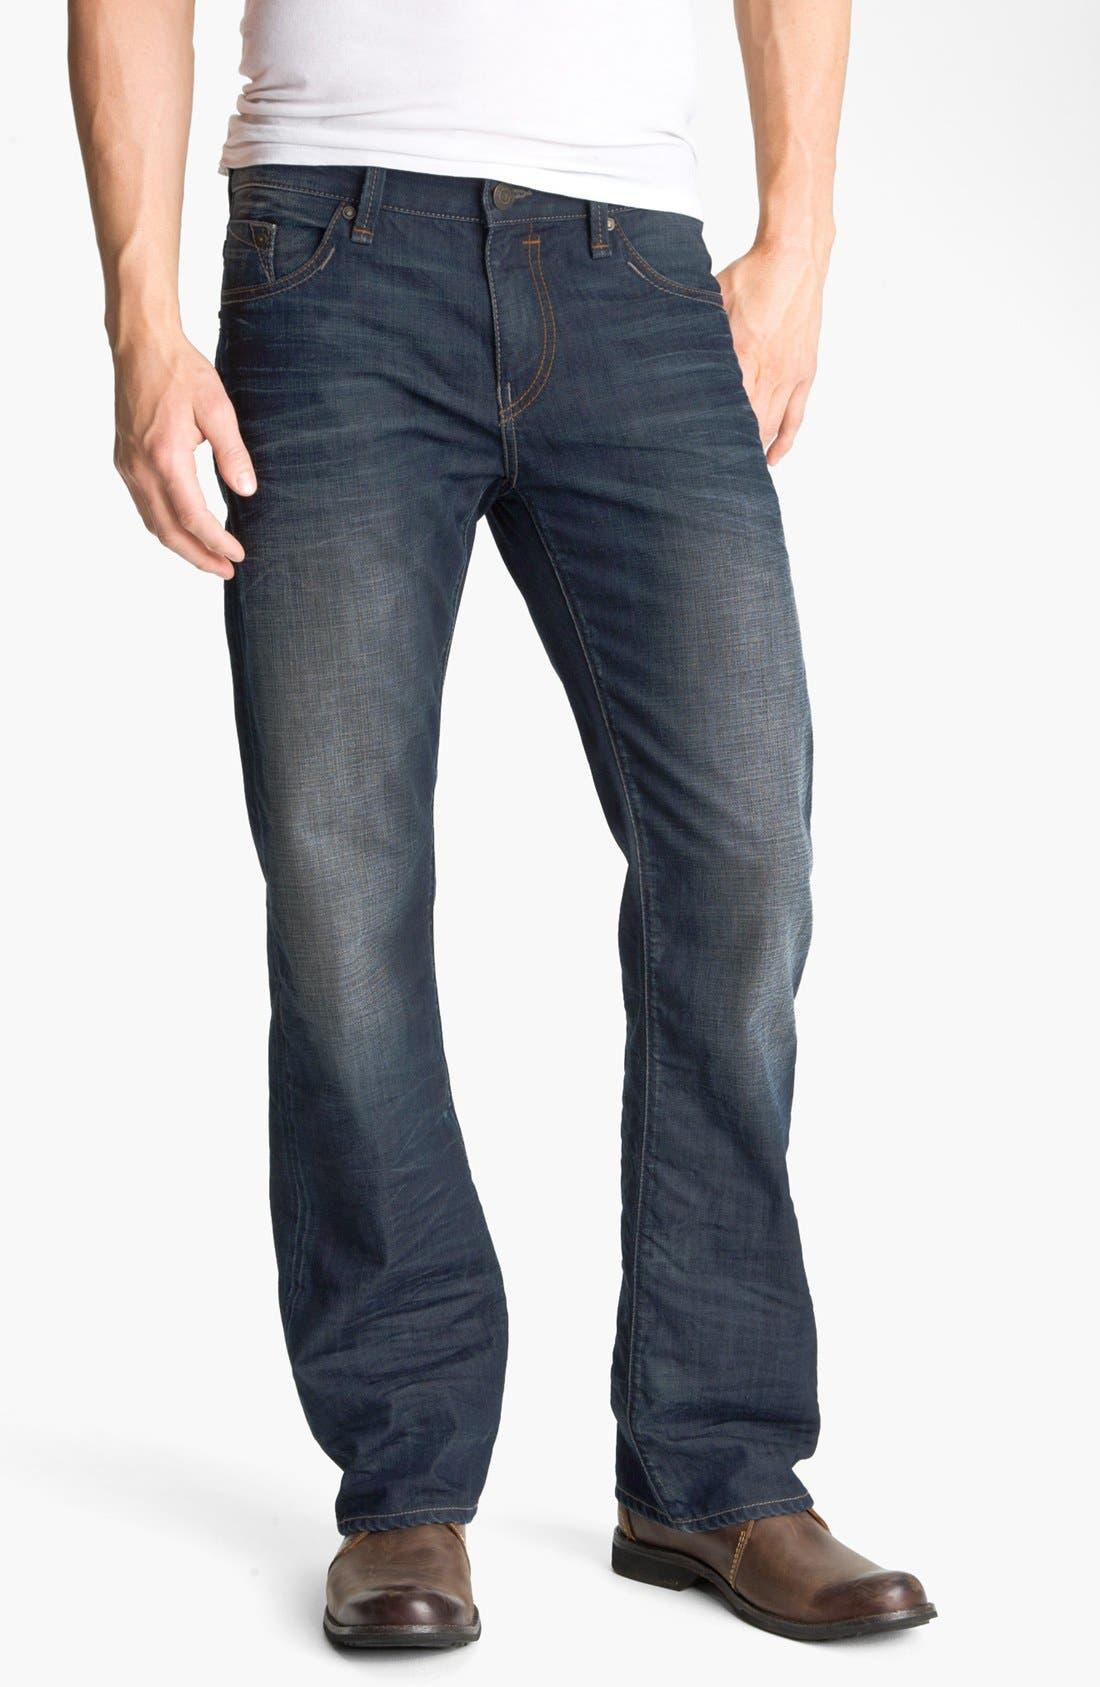 Alternate Image 2  - Mavi Jeans 'Josh' Bootcut Jeans (Coated Jameson) (Online Only)